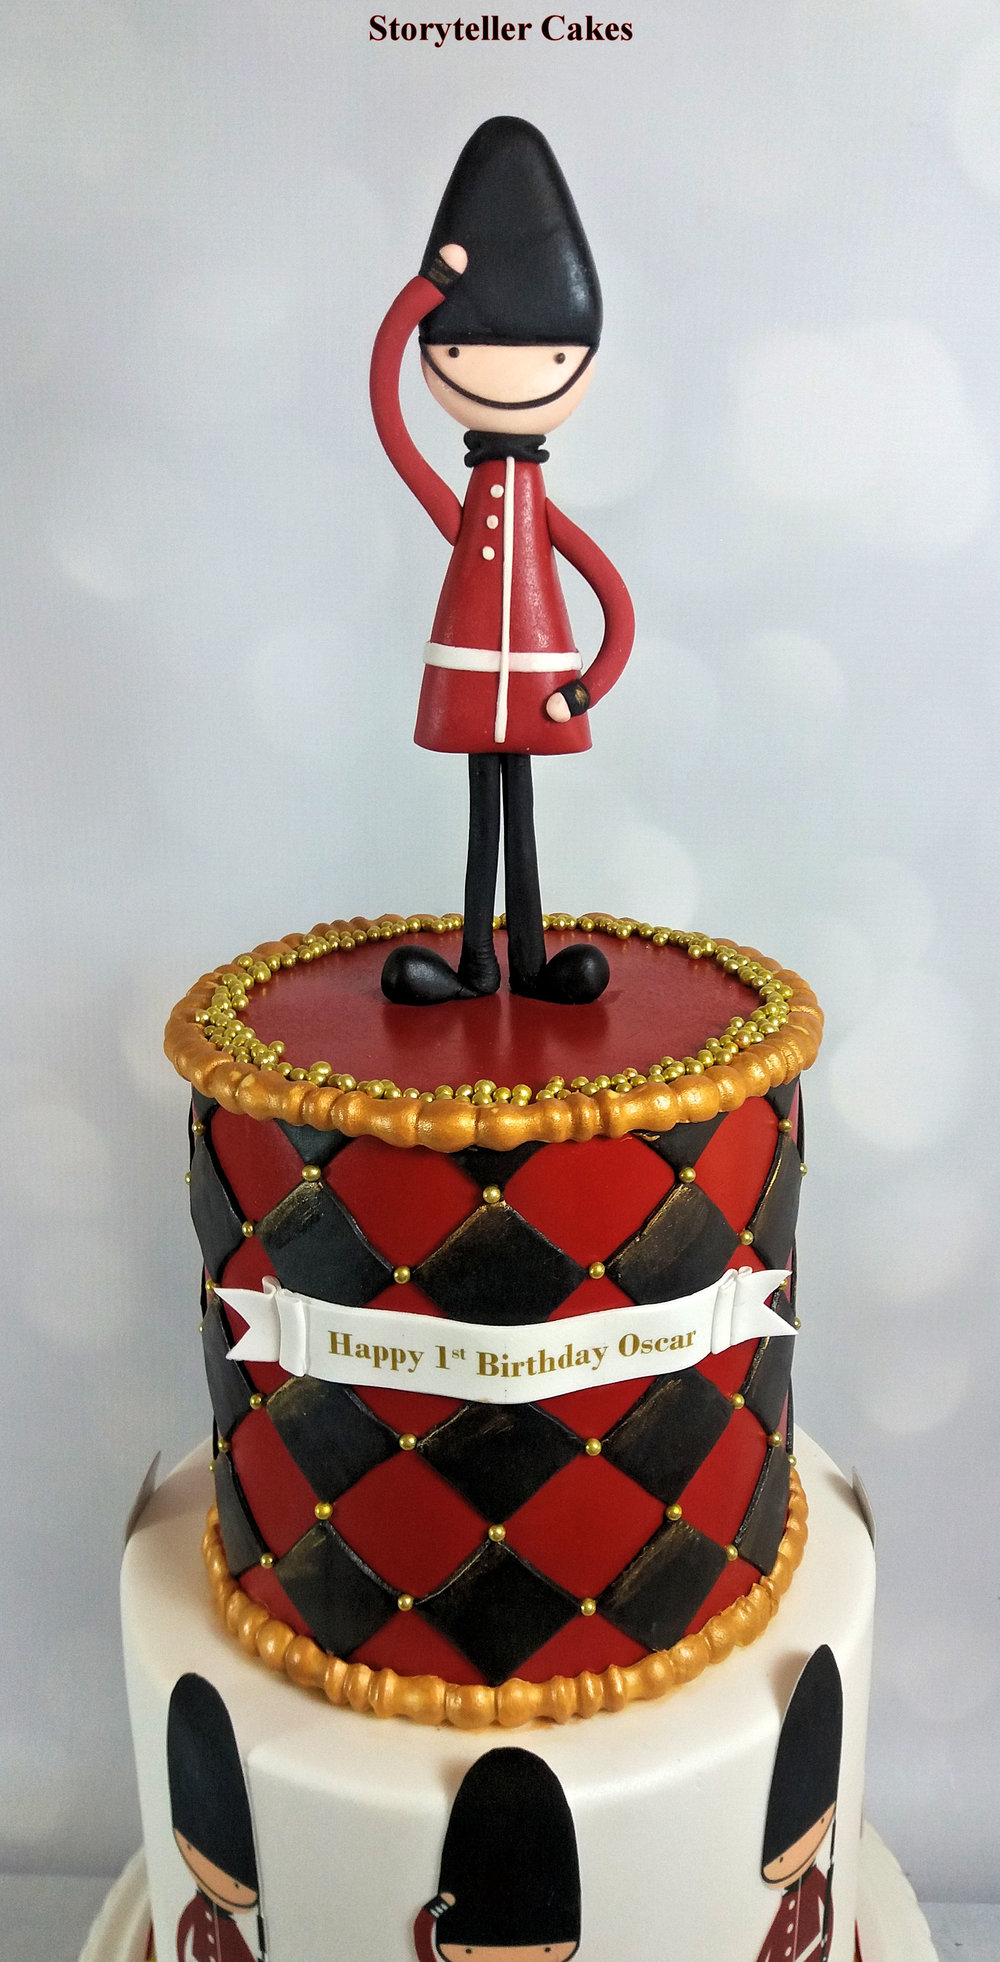 Queens Guards Boys 1st Birthday Cake 2.jpg